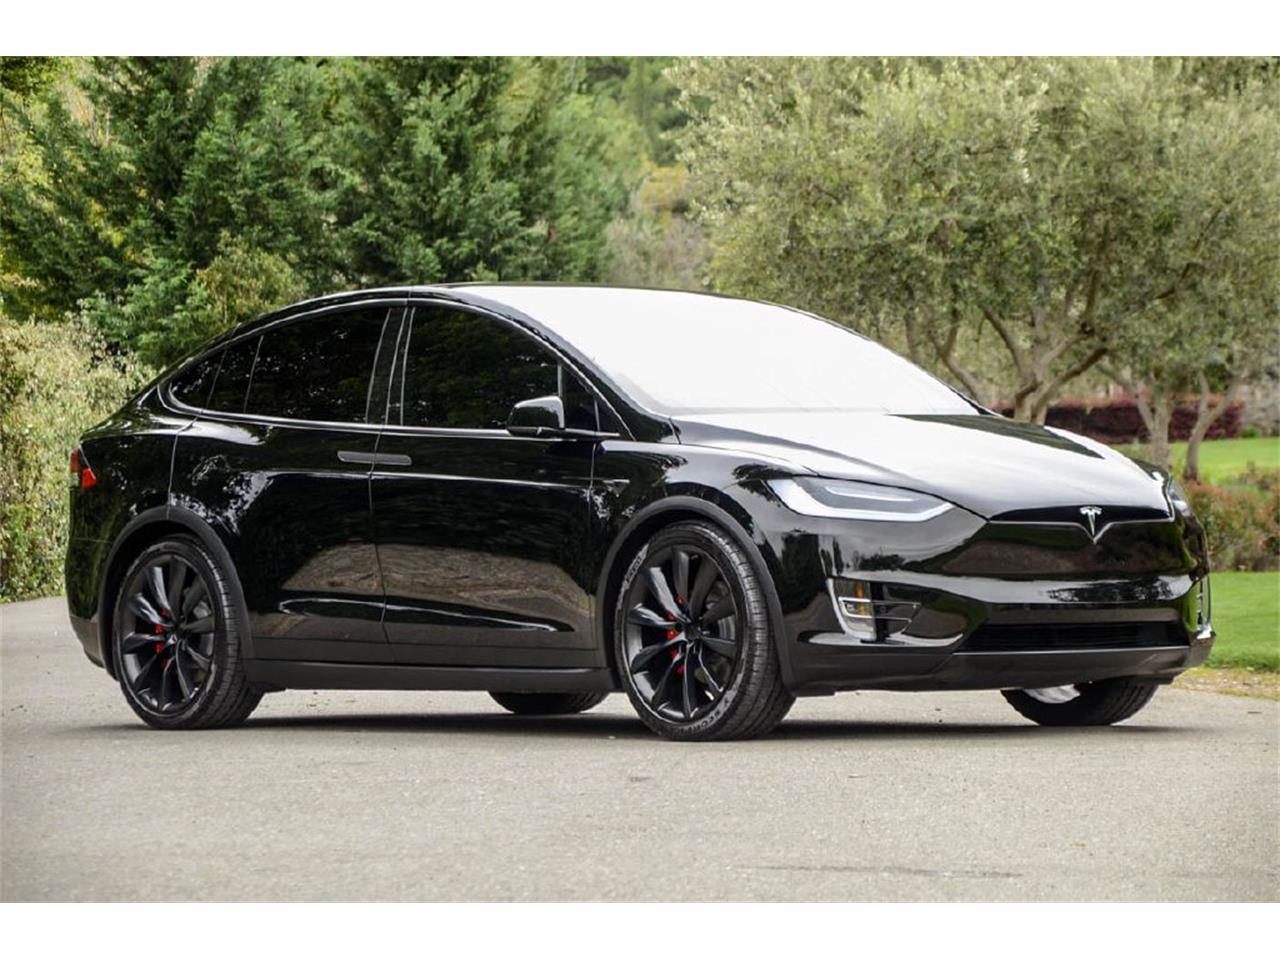 2018 Tesla Model X for Sale | ClassicCars.com | CC-1208740